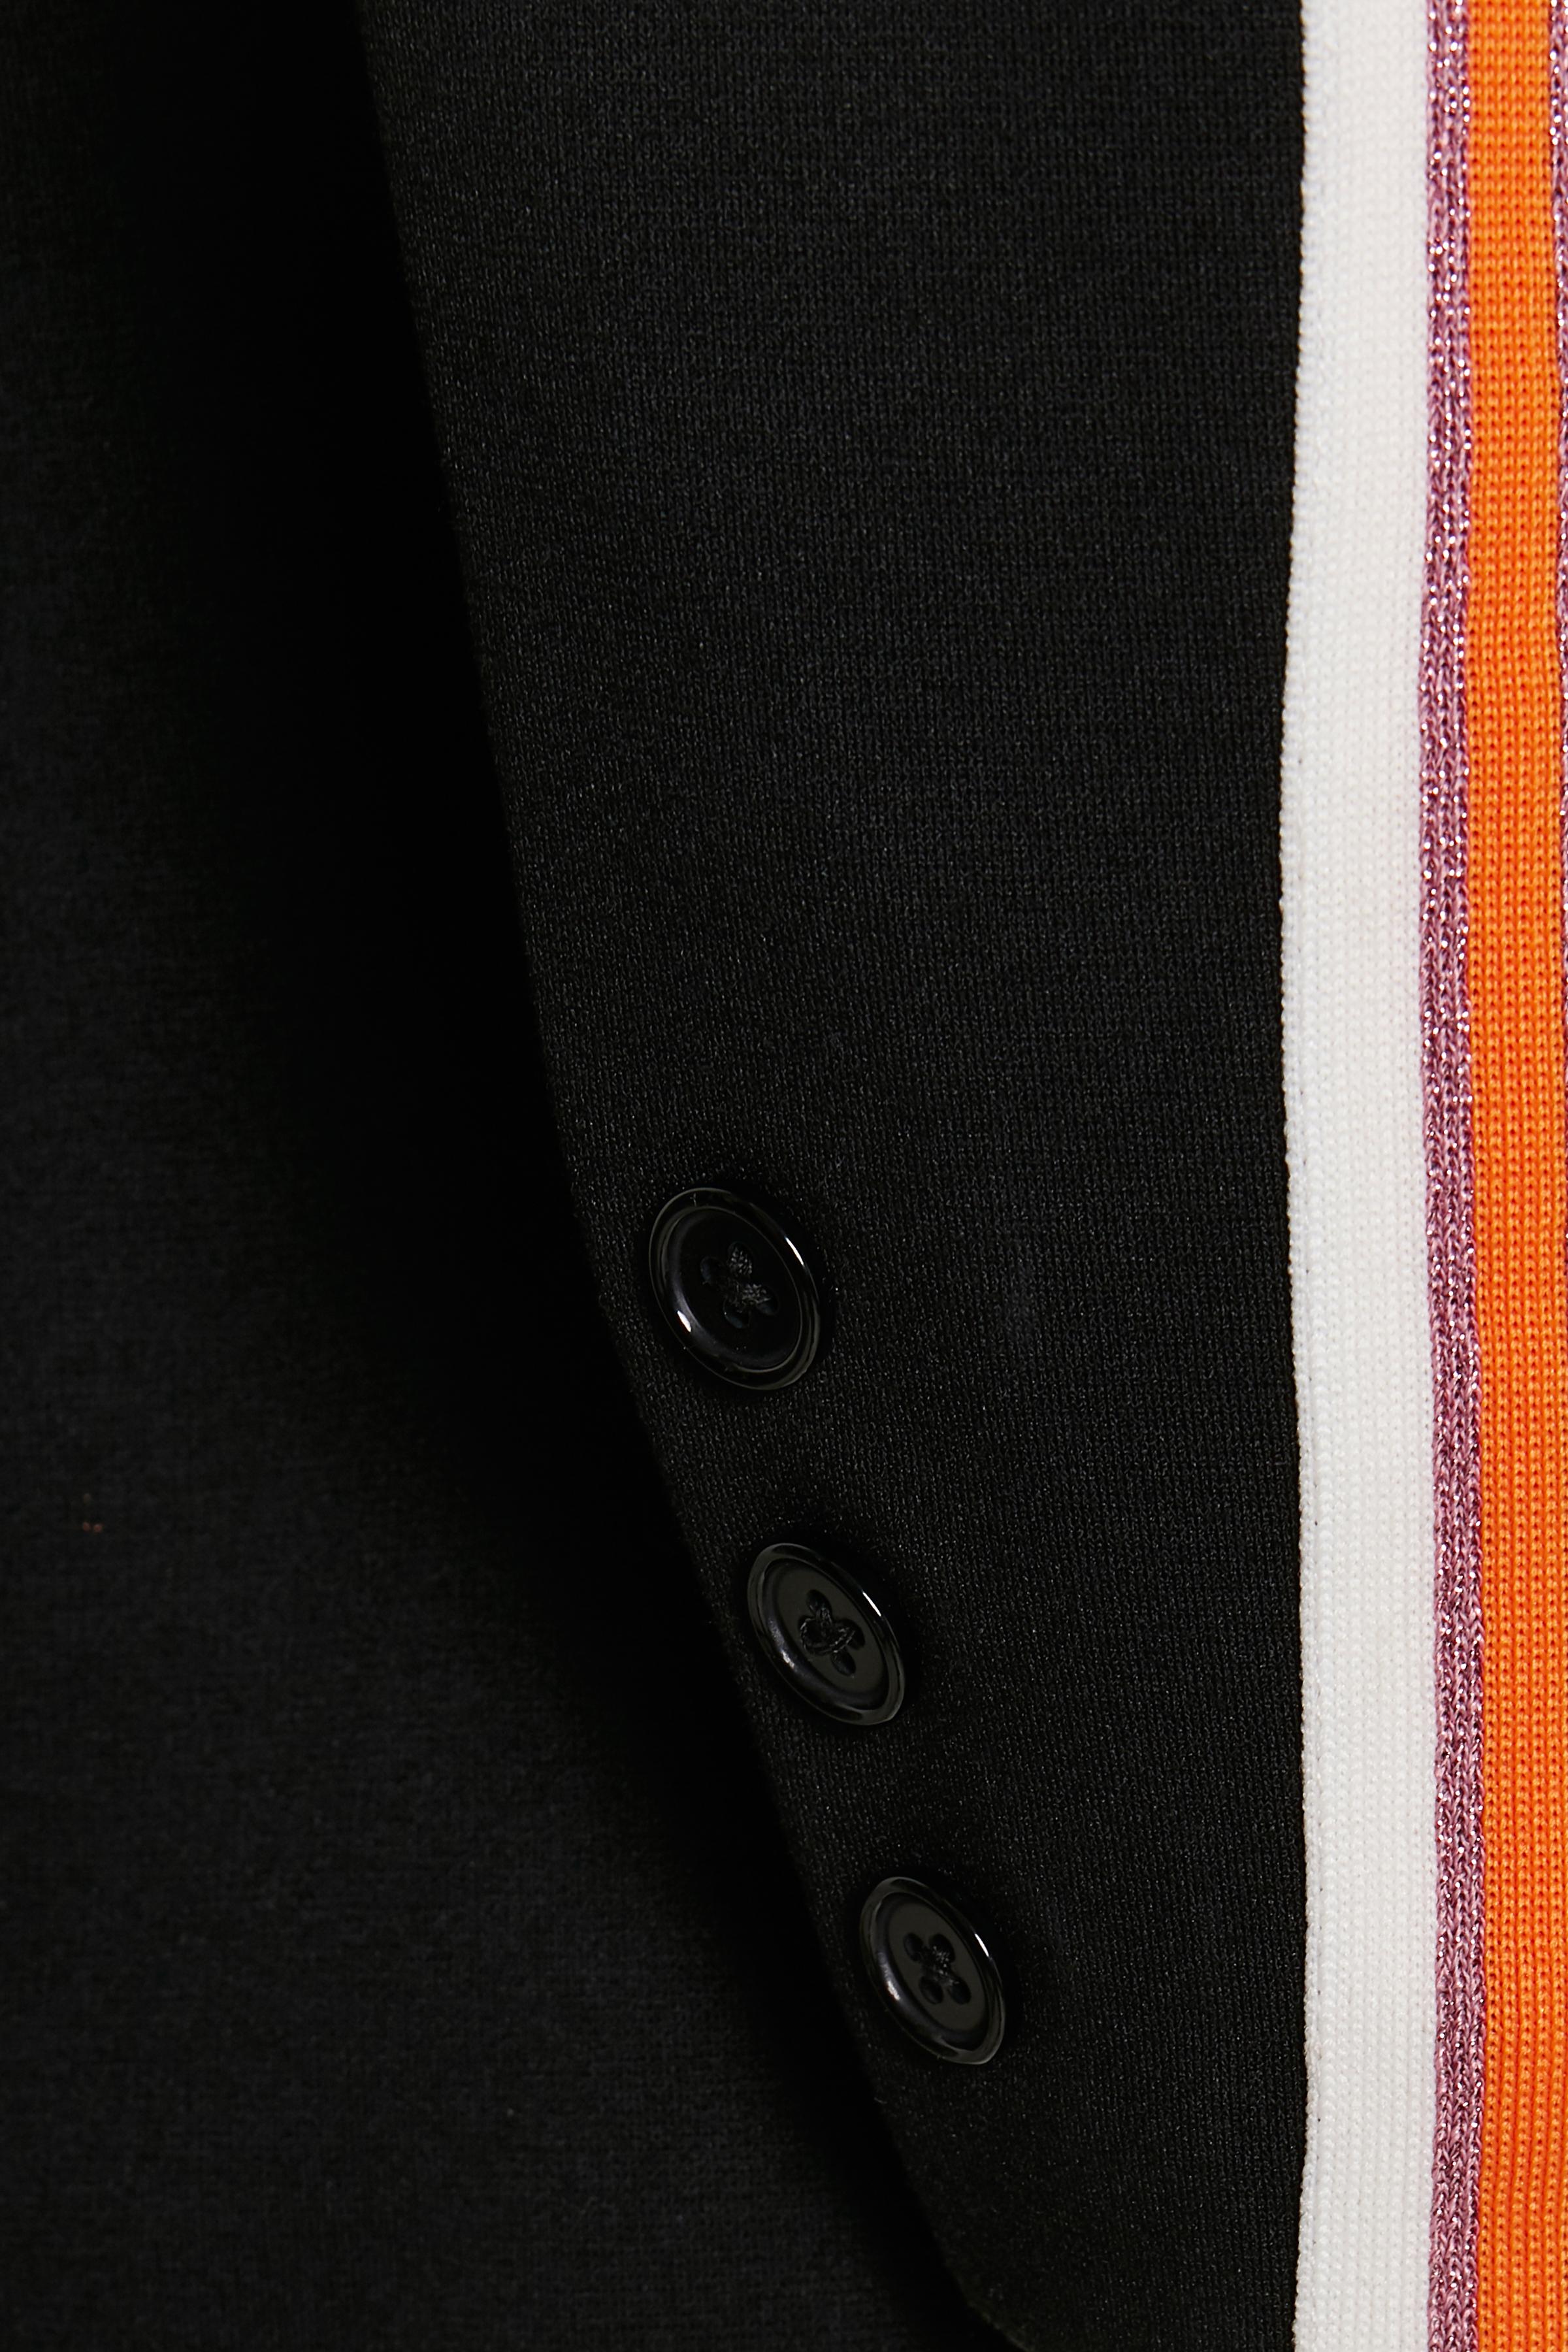 Sort Blazer fra Cream – Køb Sort Blazer fra str. XS-XXL her